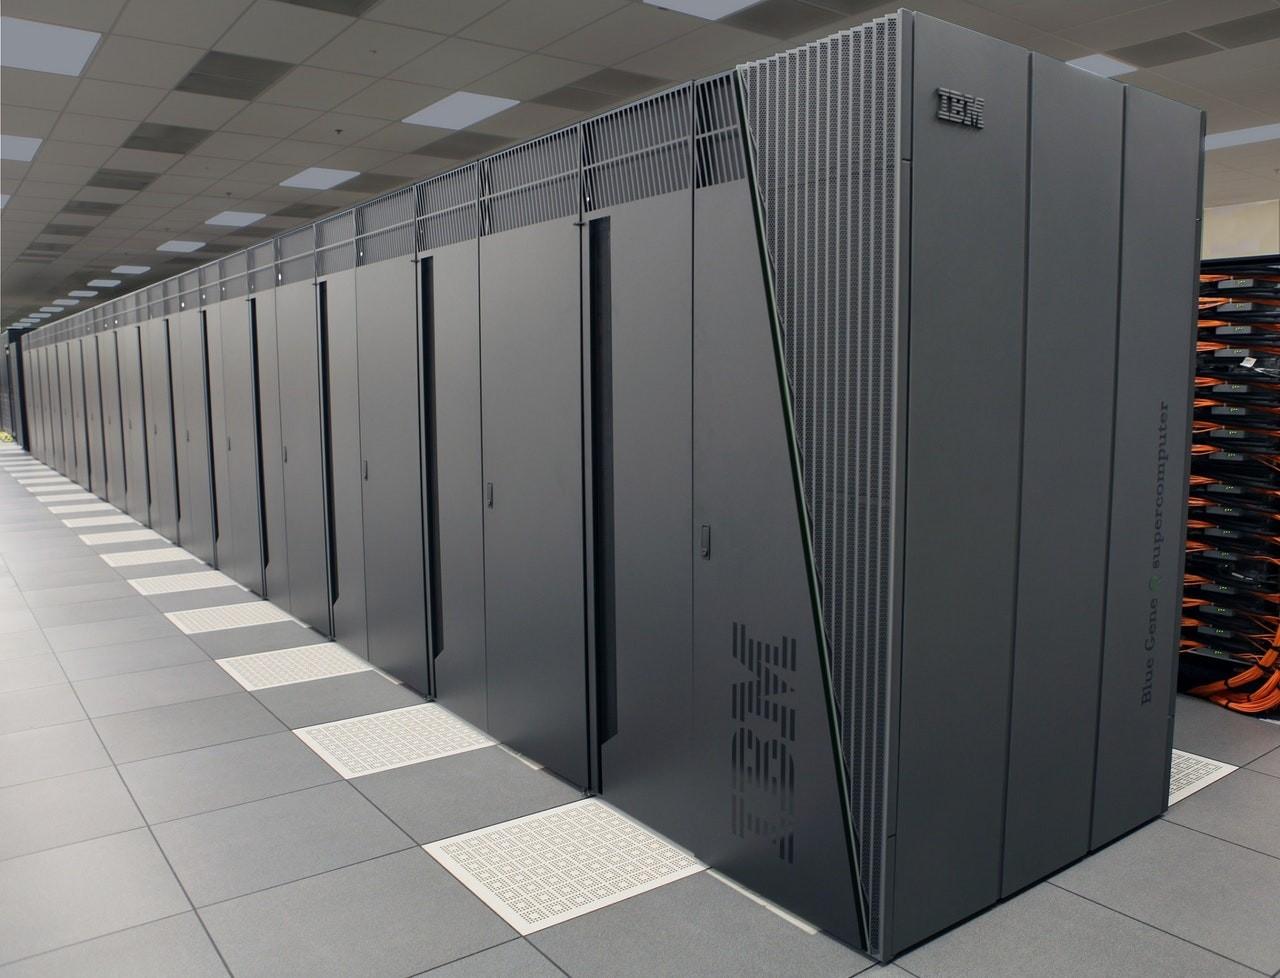 fire-suppression-data-center-server-room